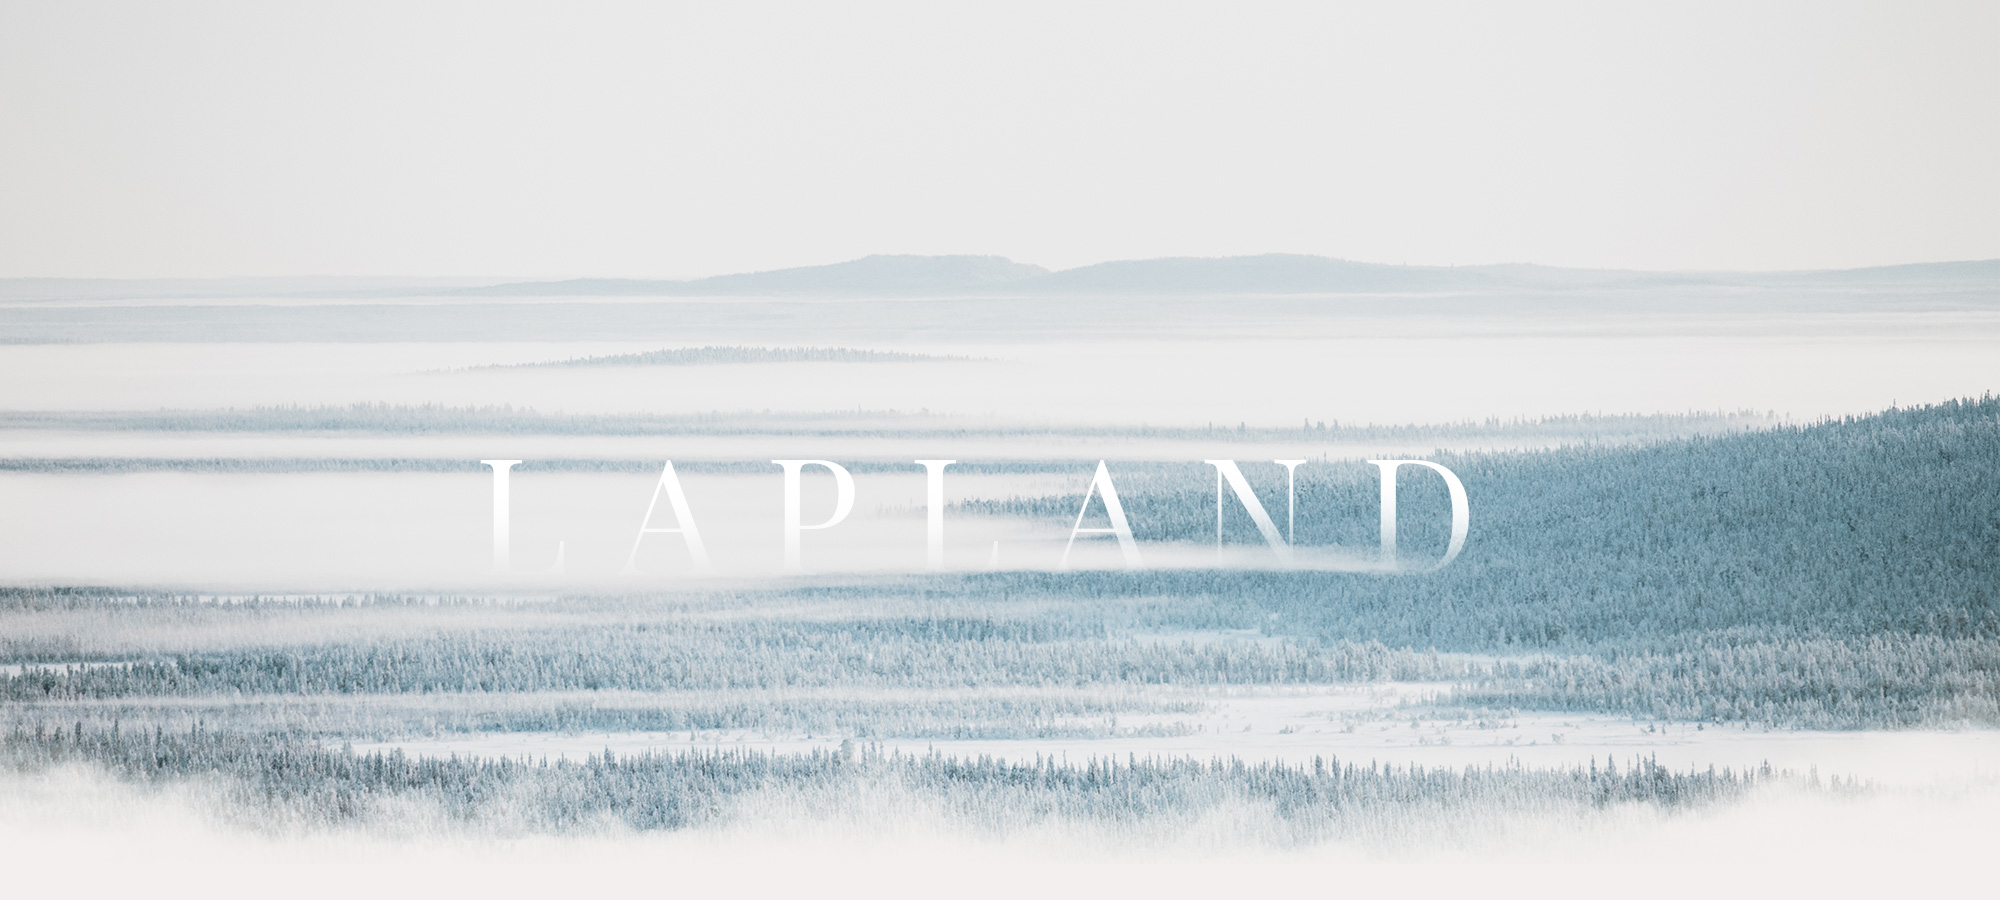 Lapland mist snow white landscape Raphaelle Monvoisin